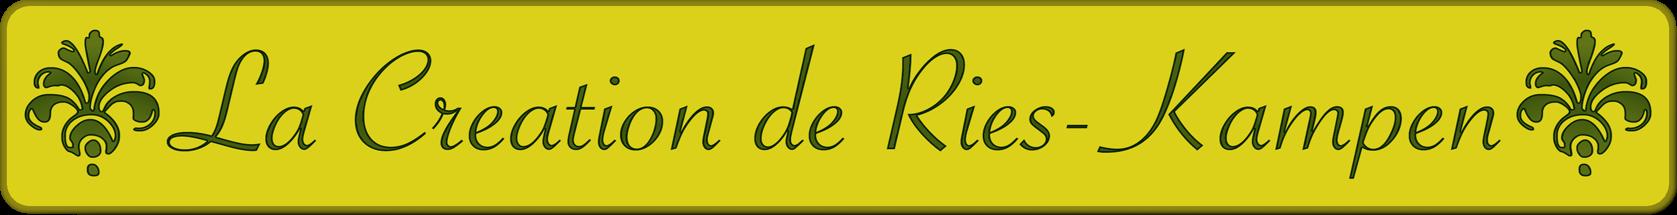 La Creation de Ries-Kampen